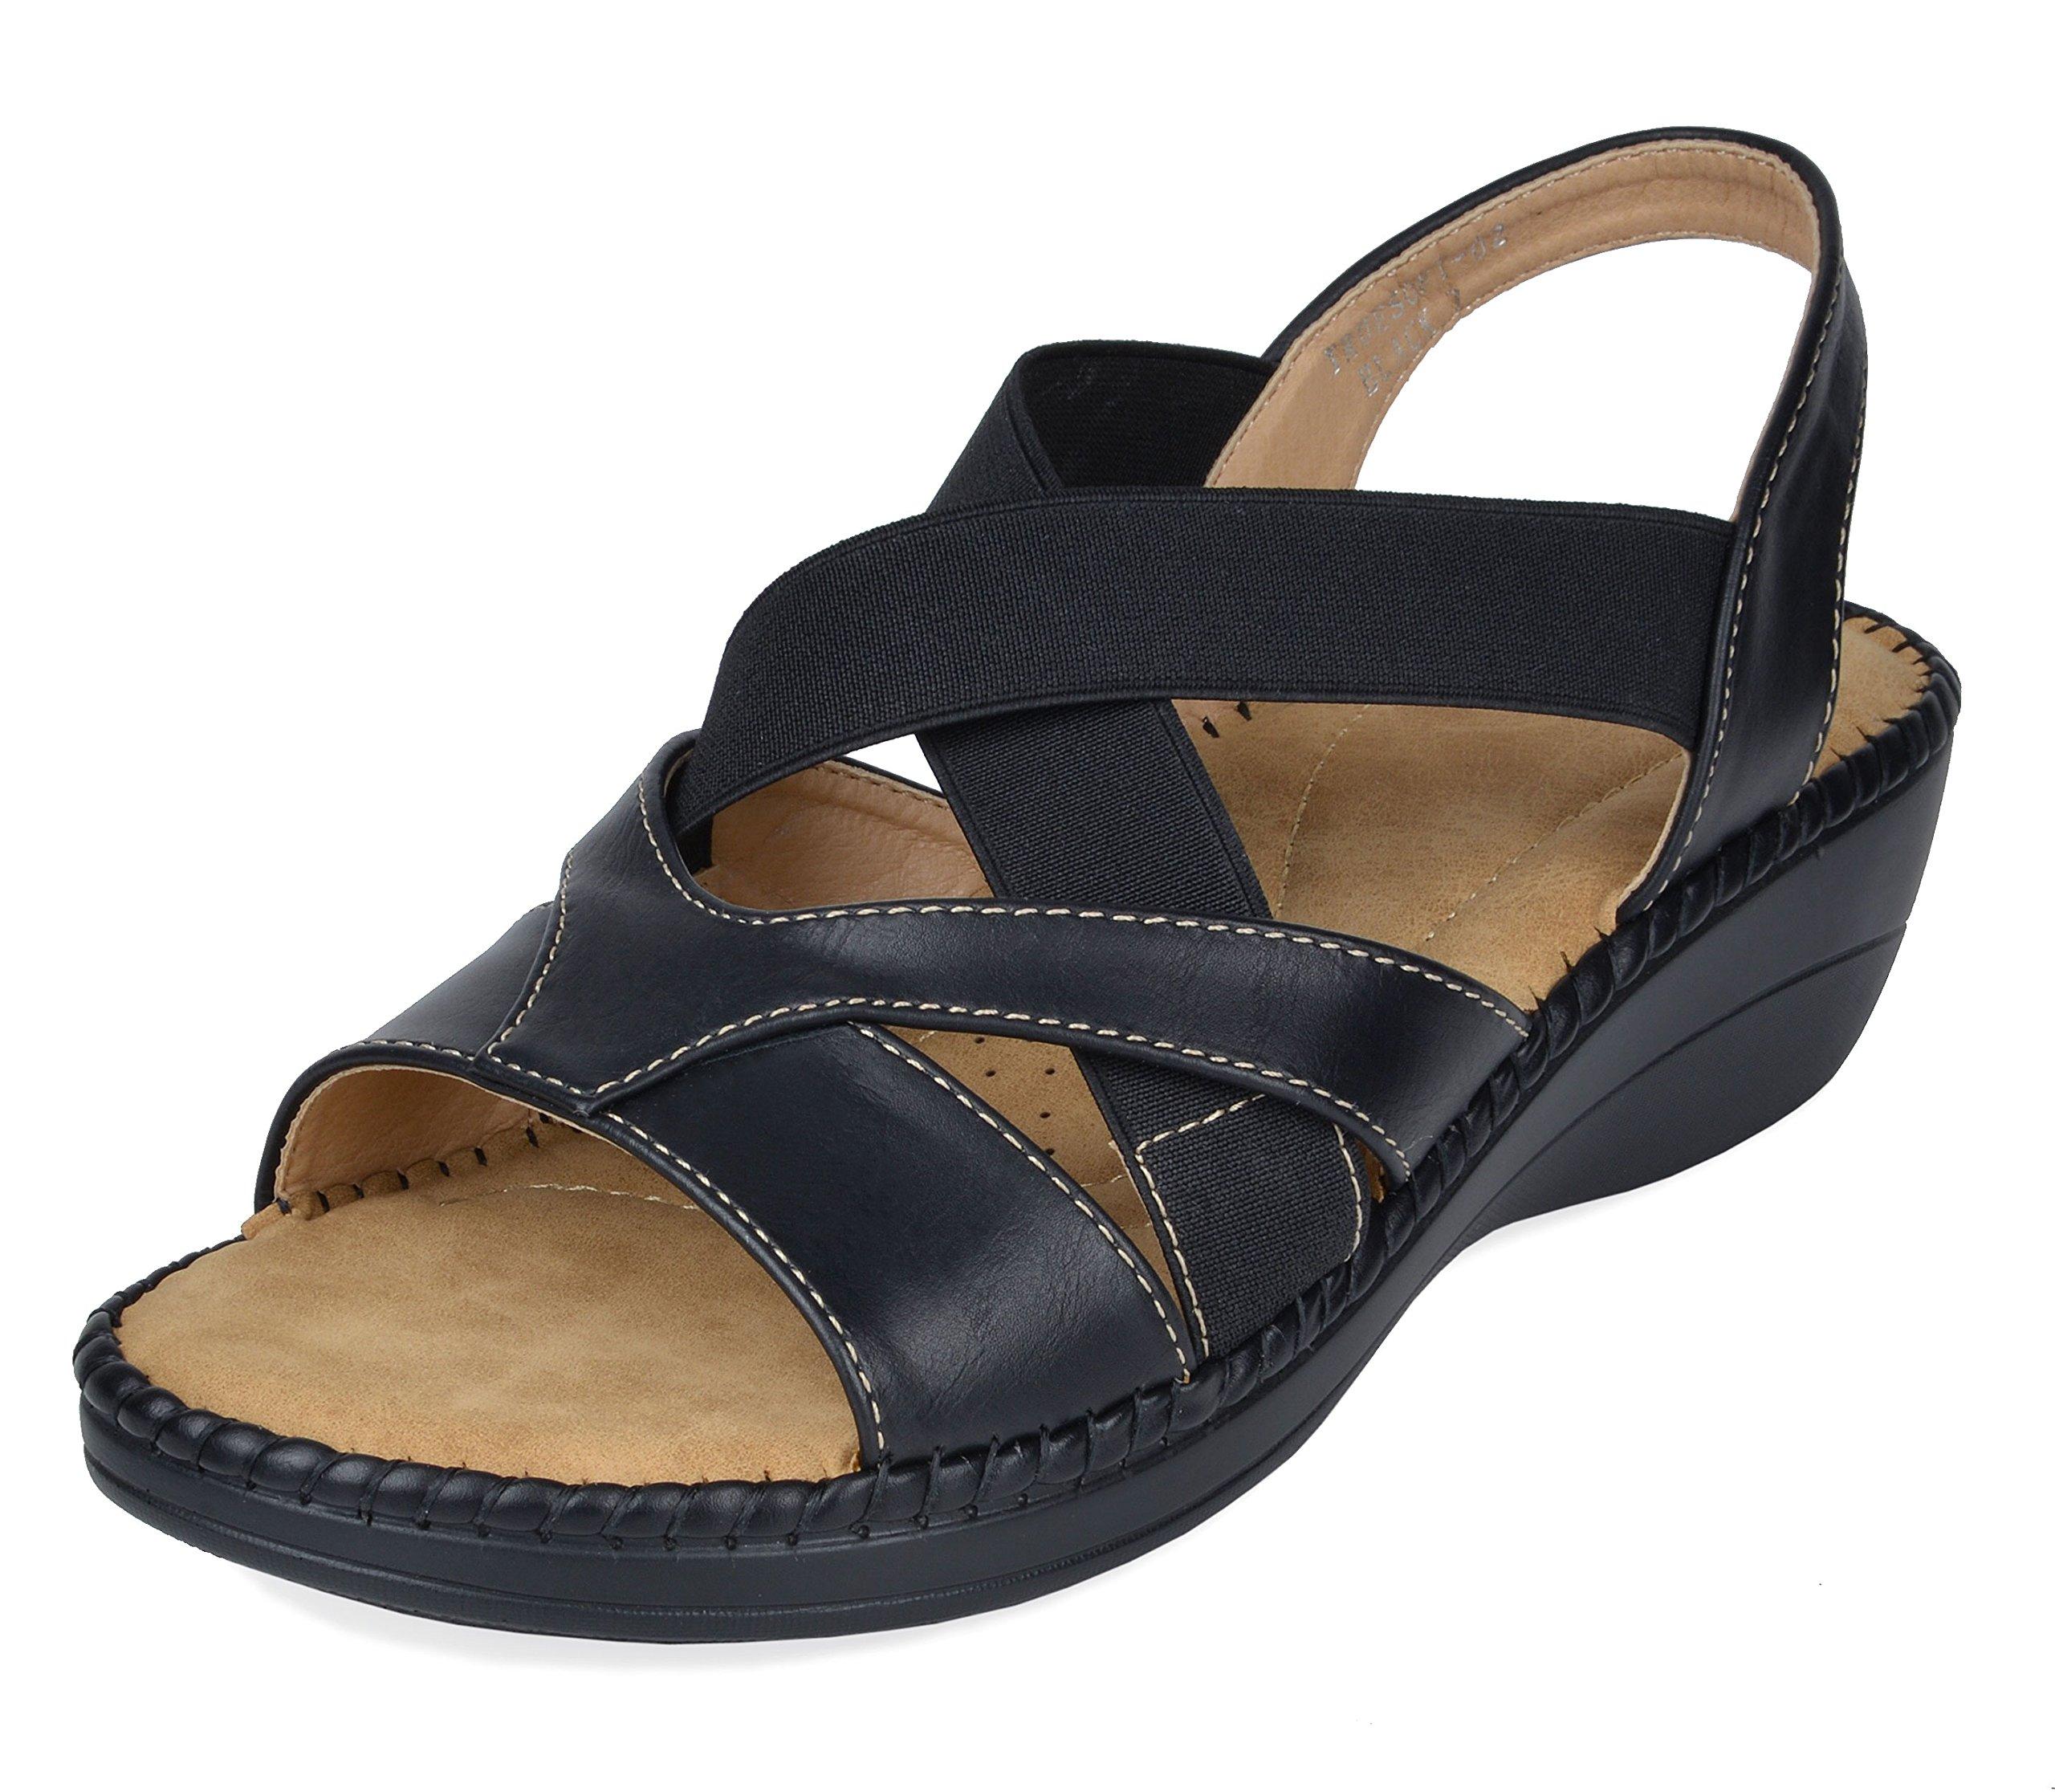 DREAM PAIRS Women's Truesoft_02 Black Low Platform Wedges Slingback Sandals Size 10 B(M) US